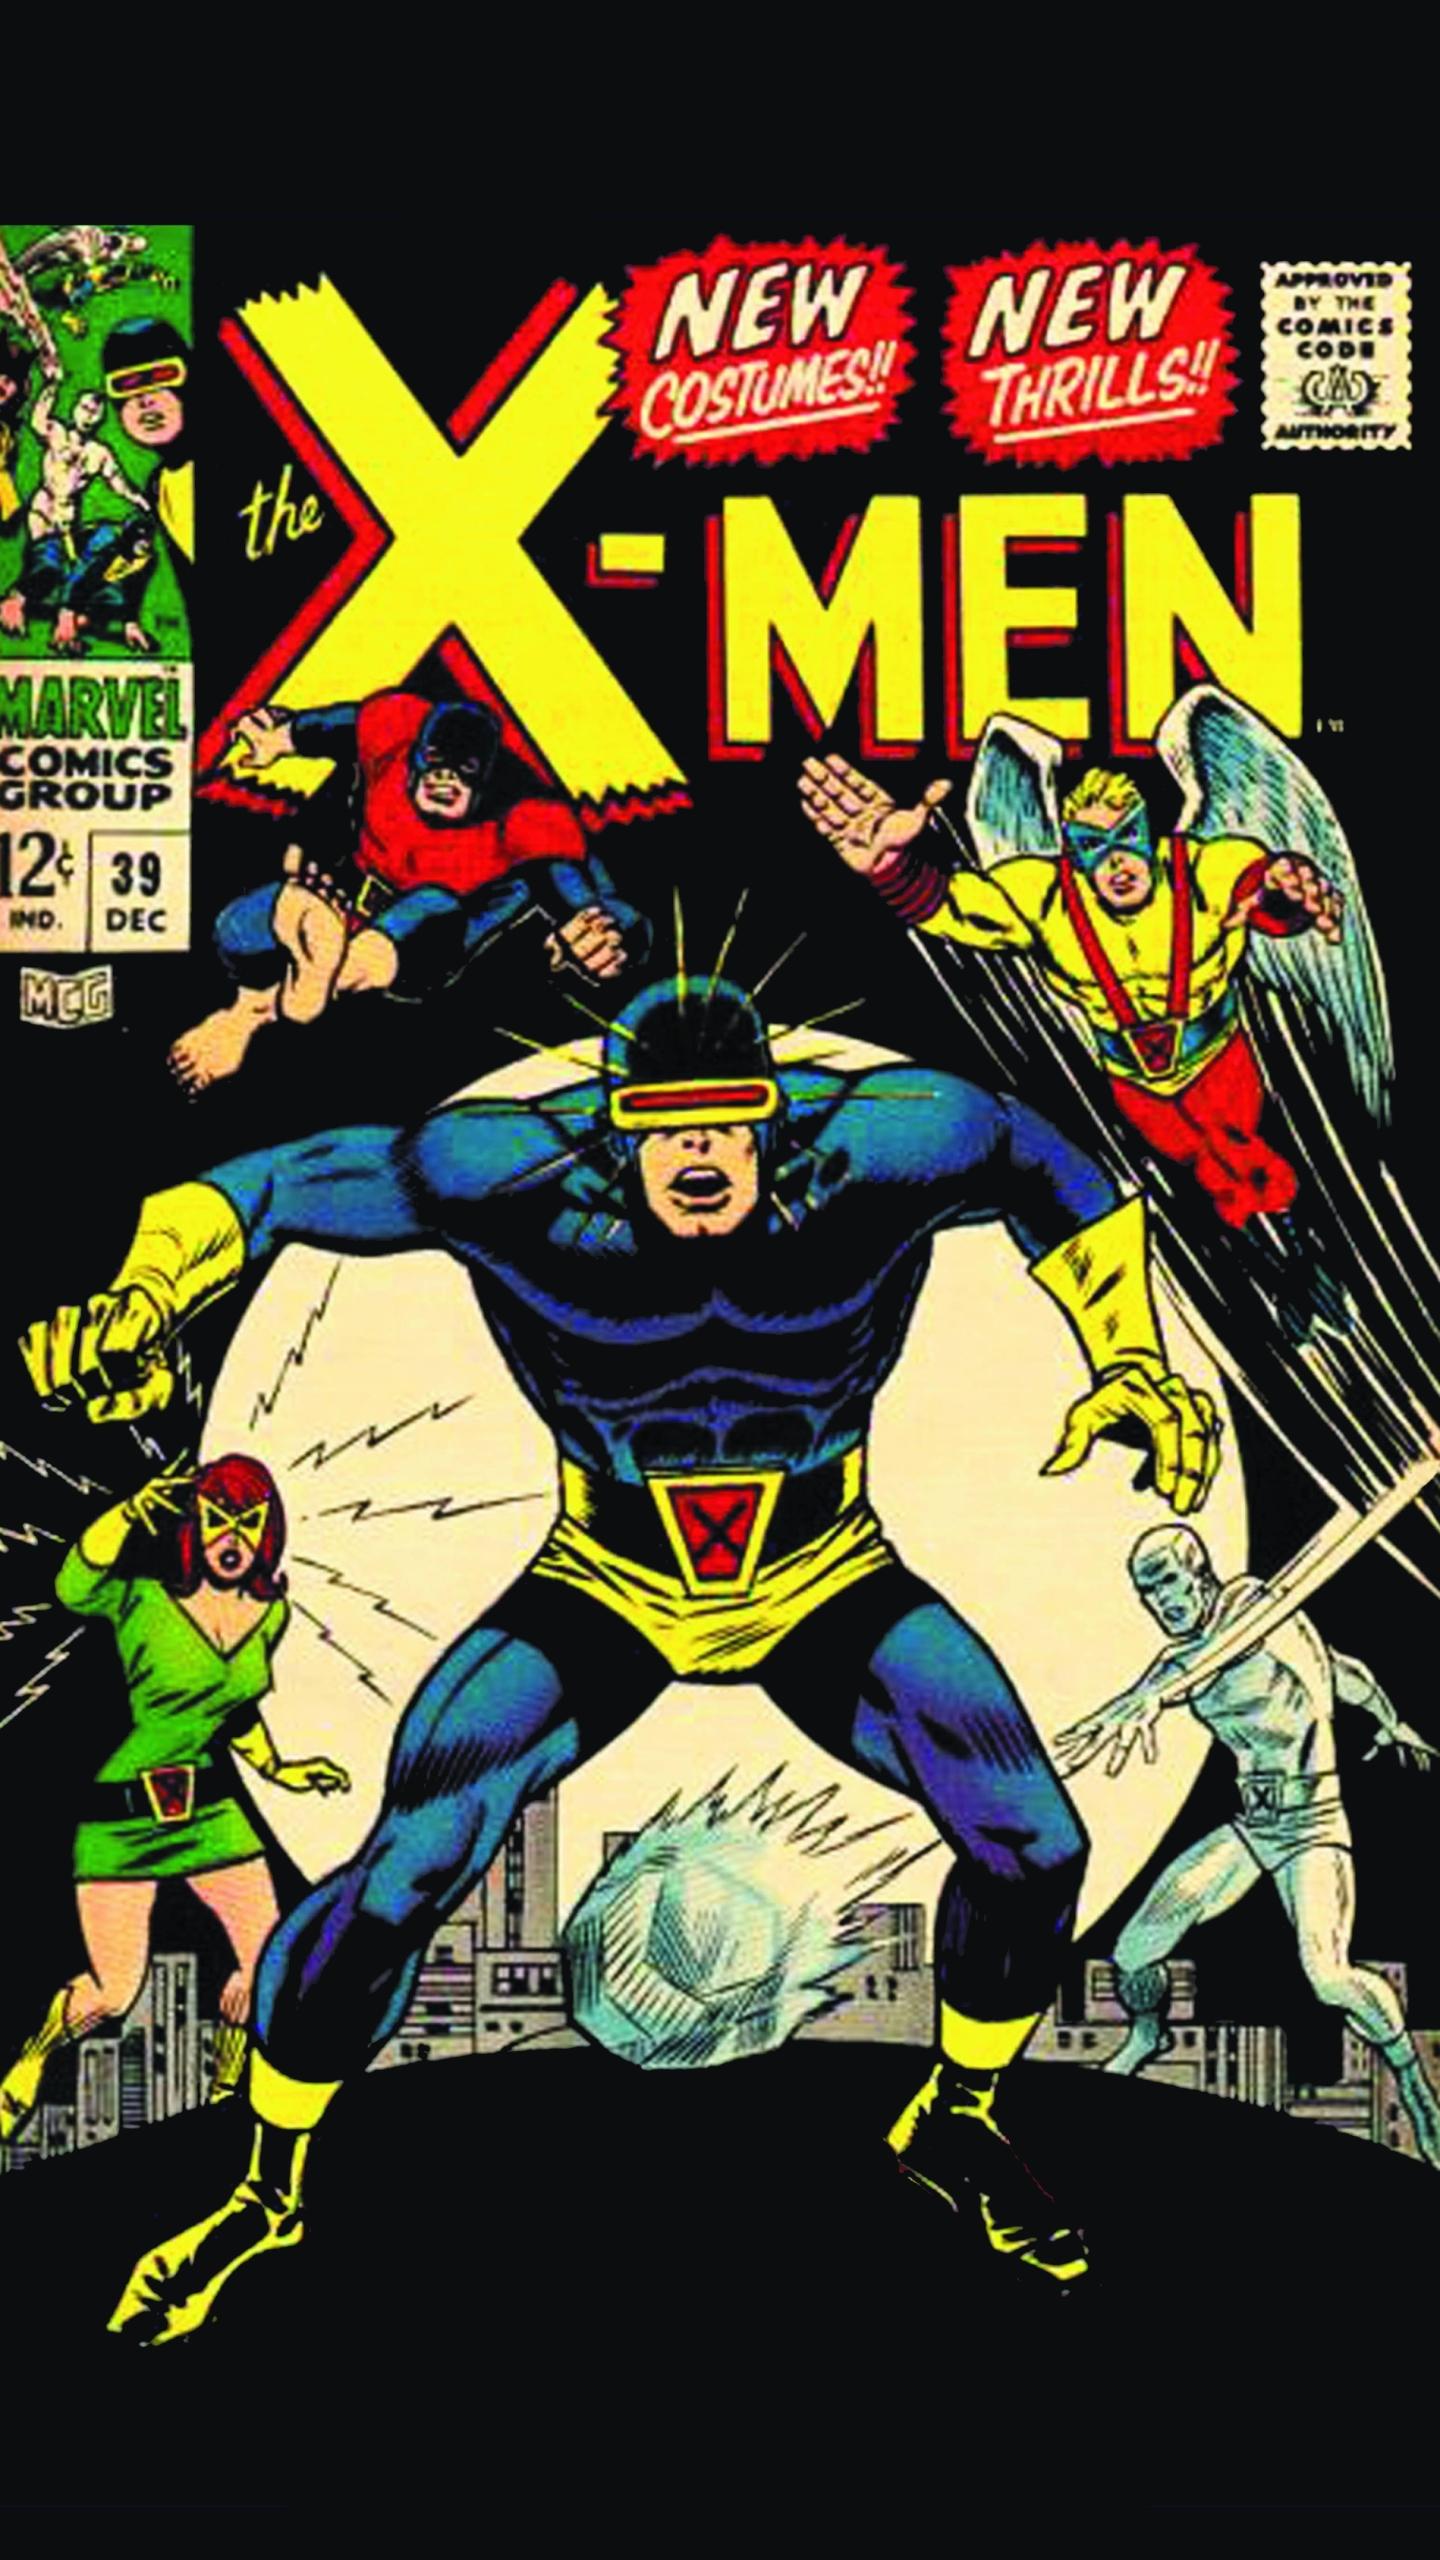 Comics X Men 1440x2560 Wallpaper Id 712805 Mobile Abyss